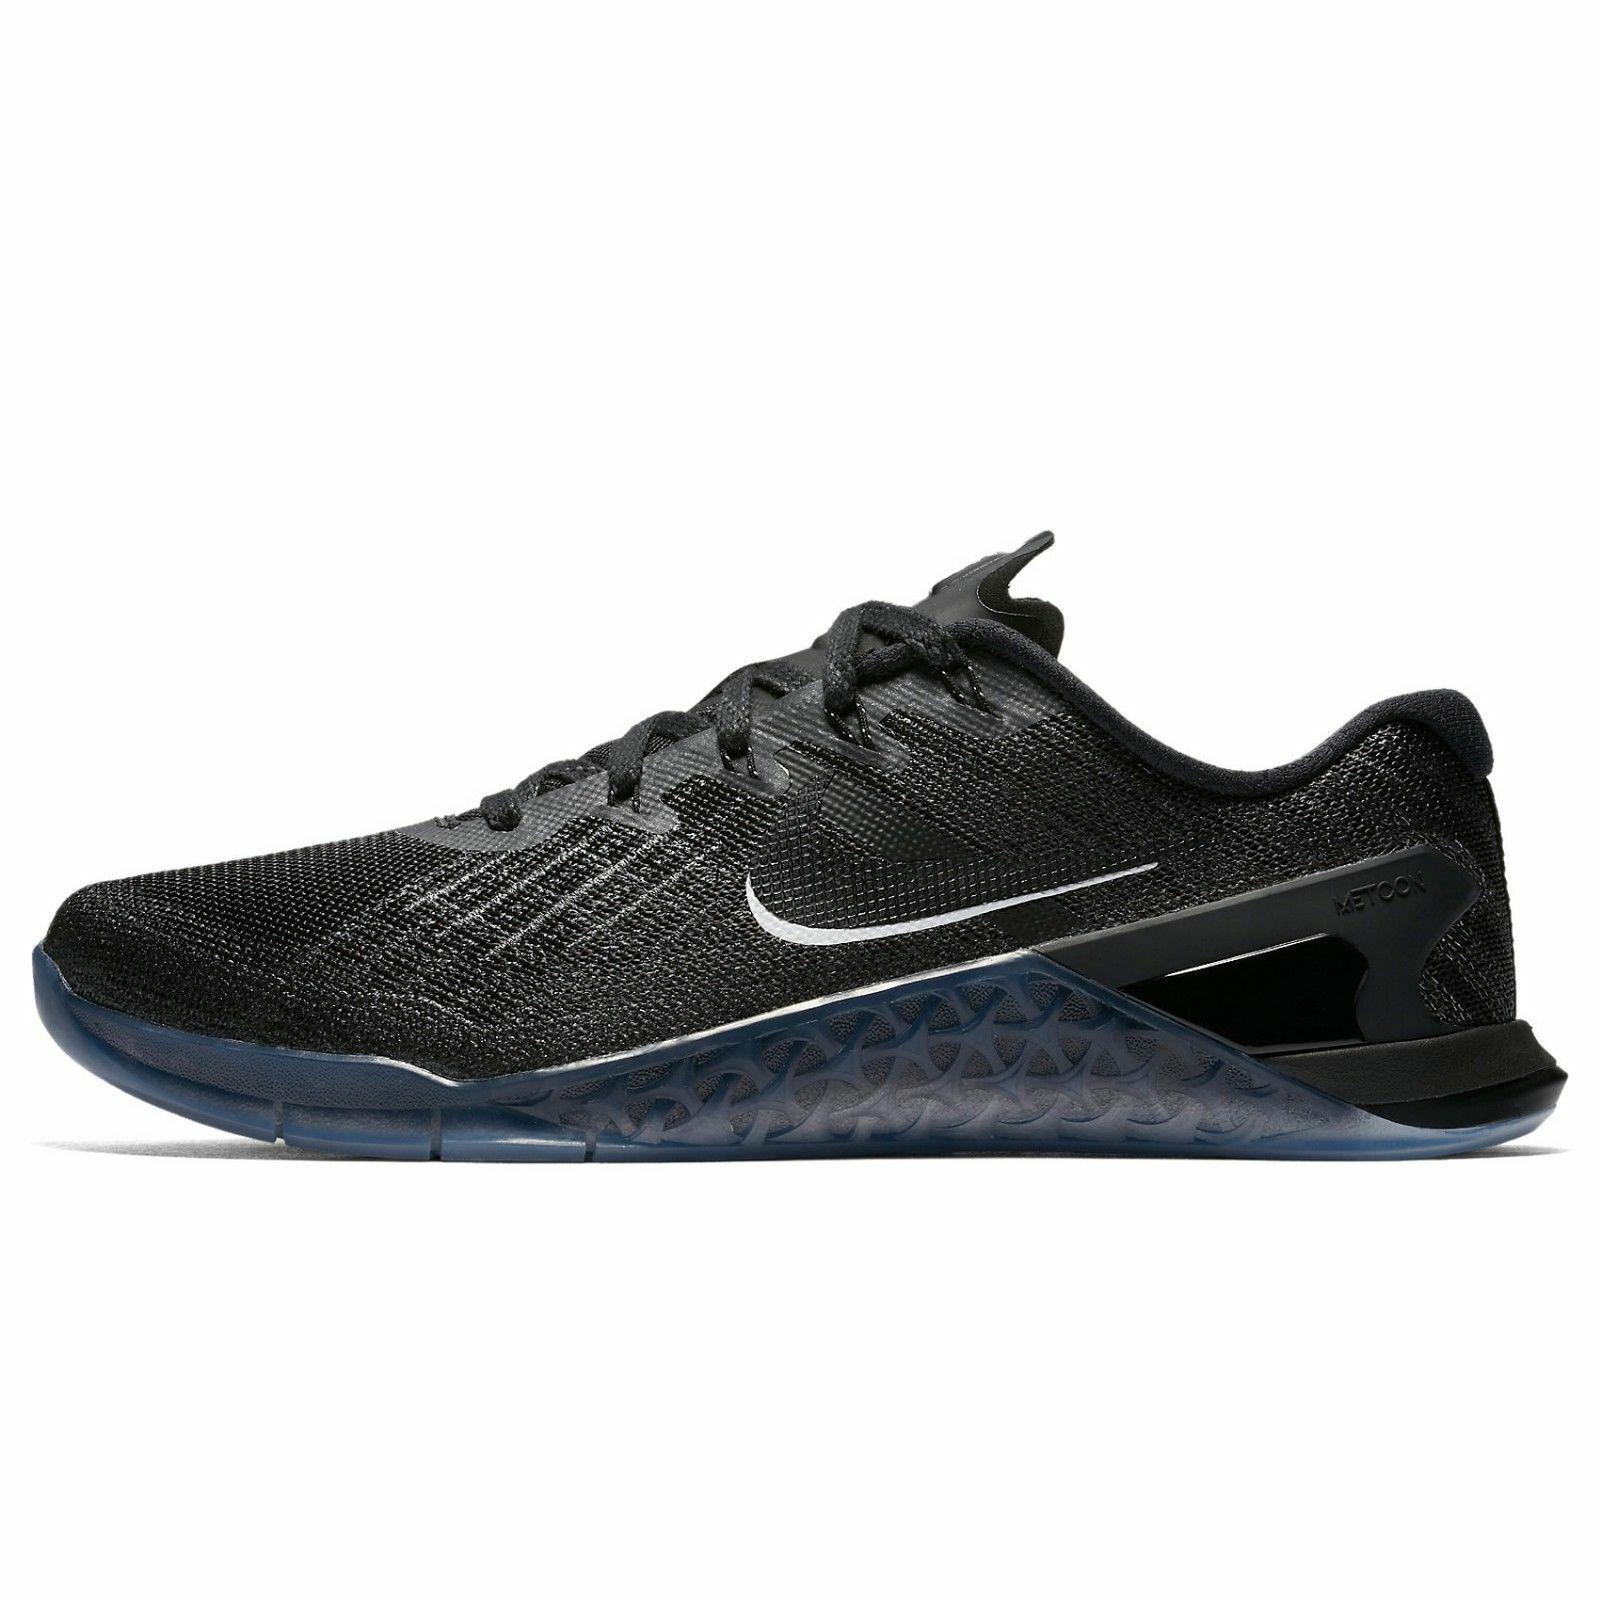 Nike Men's Metcon 3 - Black Black-White (852928-011)